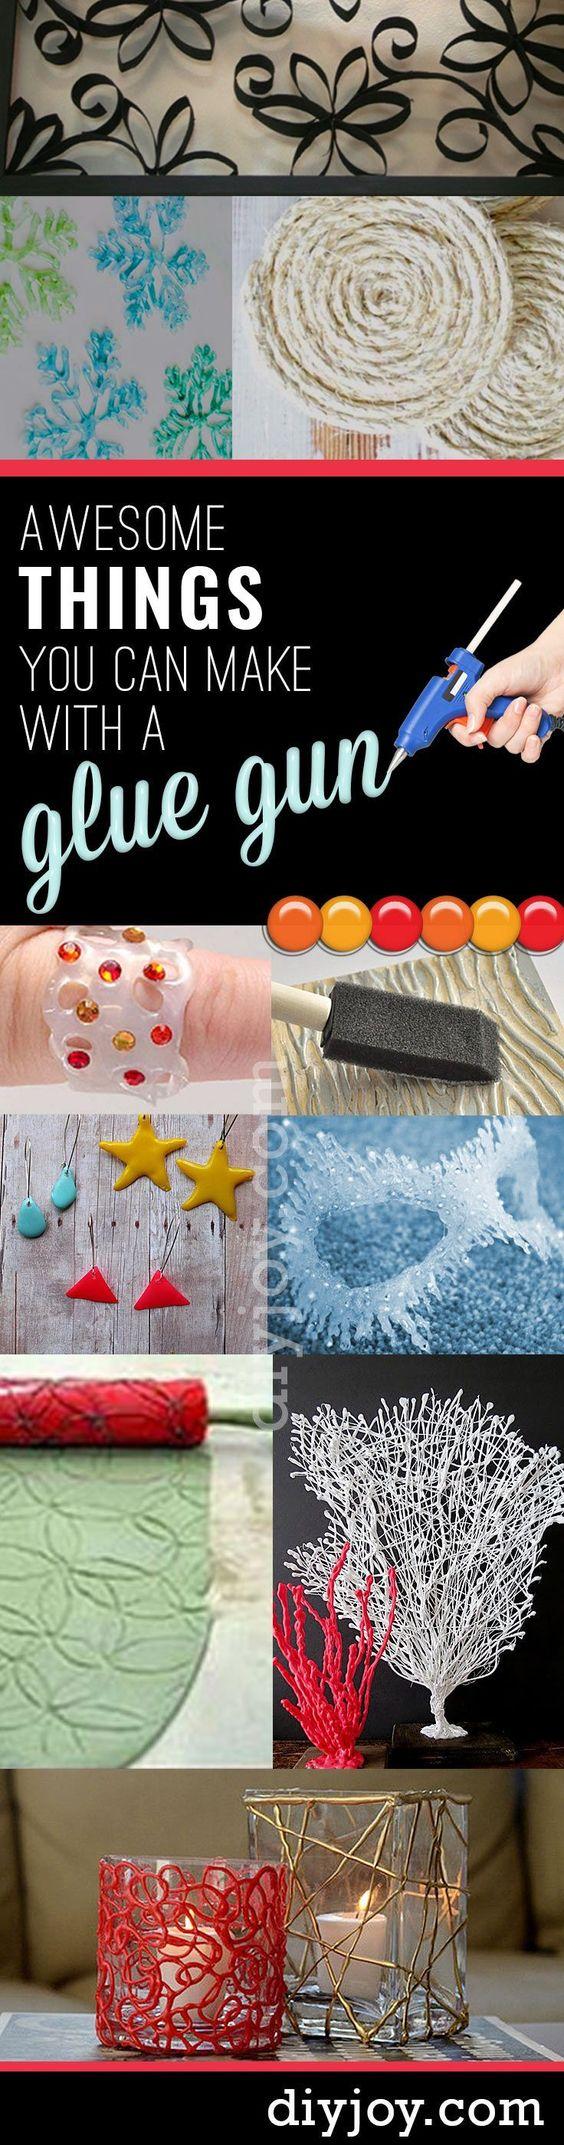 Best Hot Glue Gun Crafts, DIY Projects and Arts and Crafts Ideas Using Glue Gun Sticks   Creative DIY Ideas for Teens diyjoy.com/...